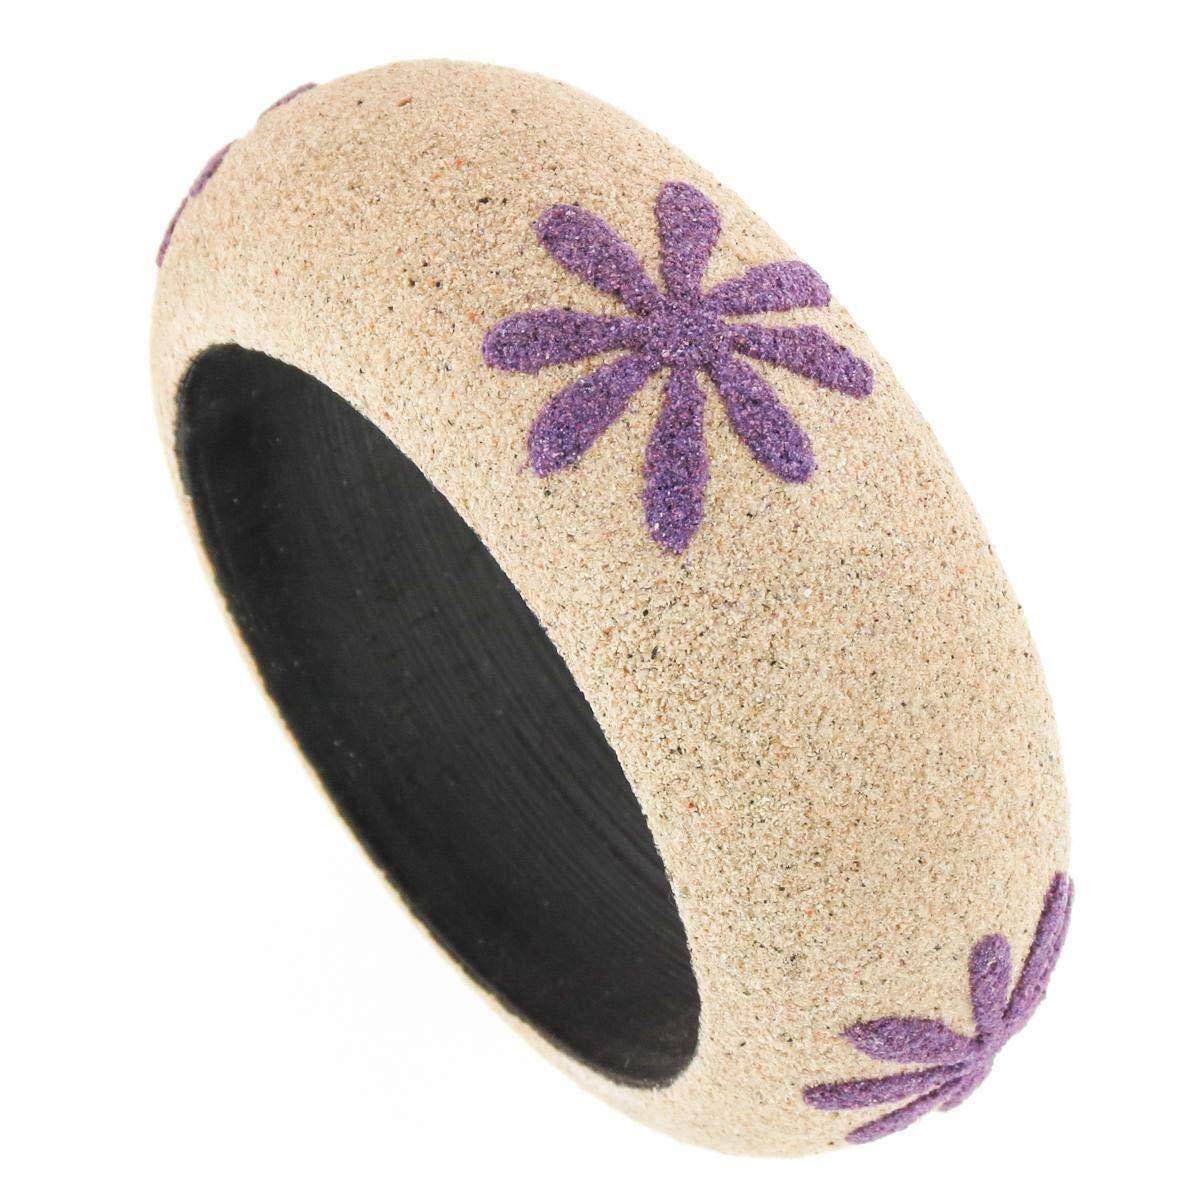 Cool 1 1//8 Wide Creamy White Purple Sand Over Wood Bangle Bracelet YE-2329